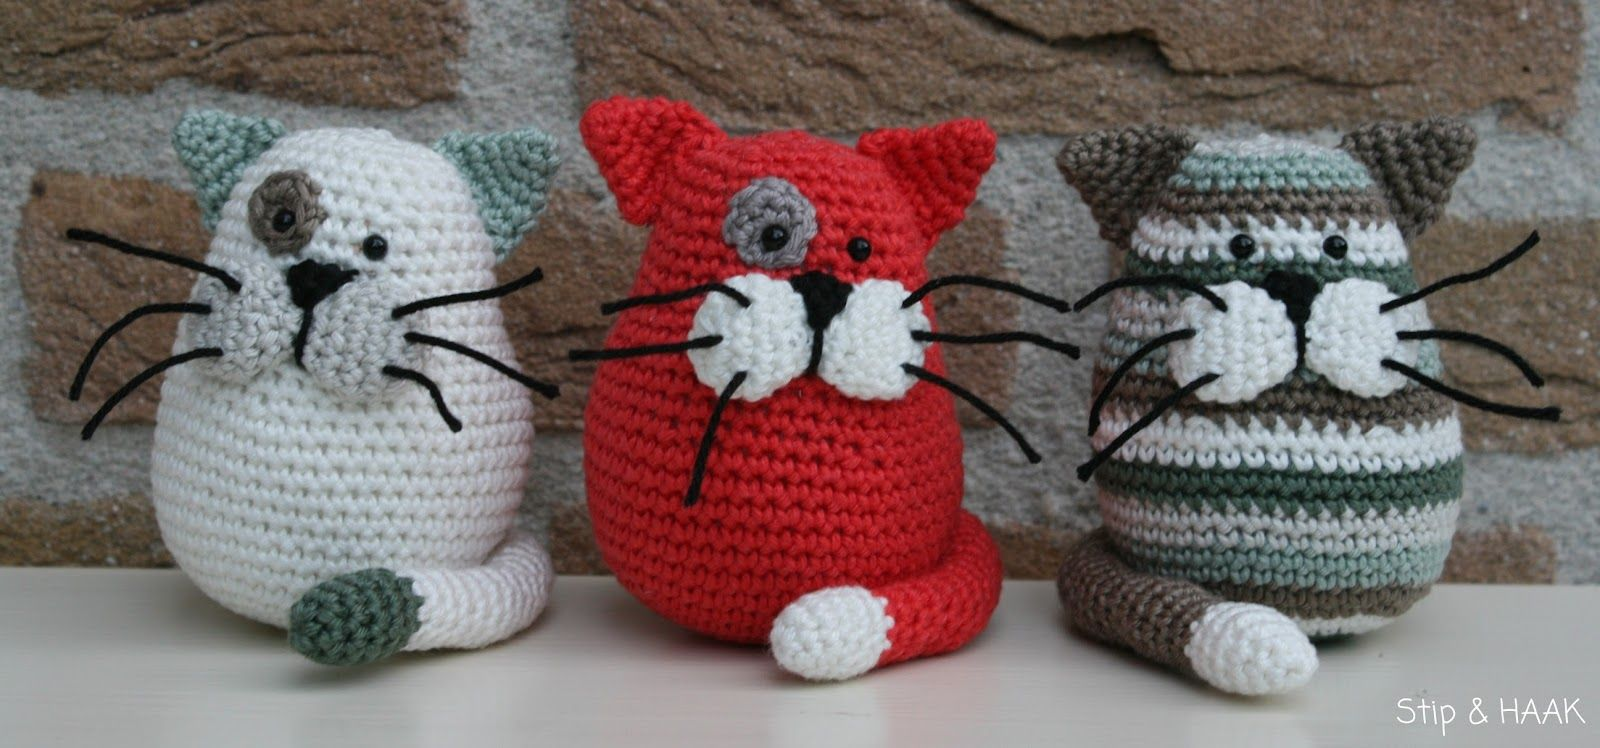 niedliche Katzen http://stipenhaak.blogspot.nl/p/gratis-patronen_28 ...